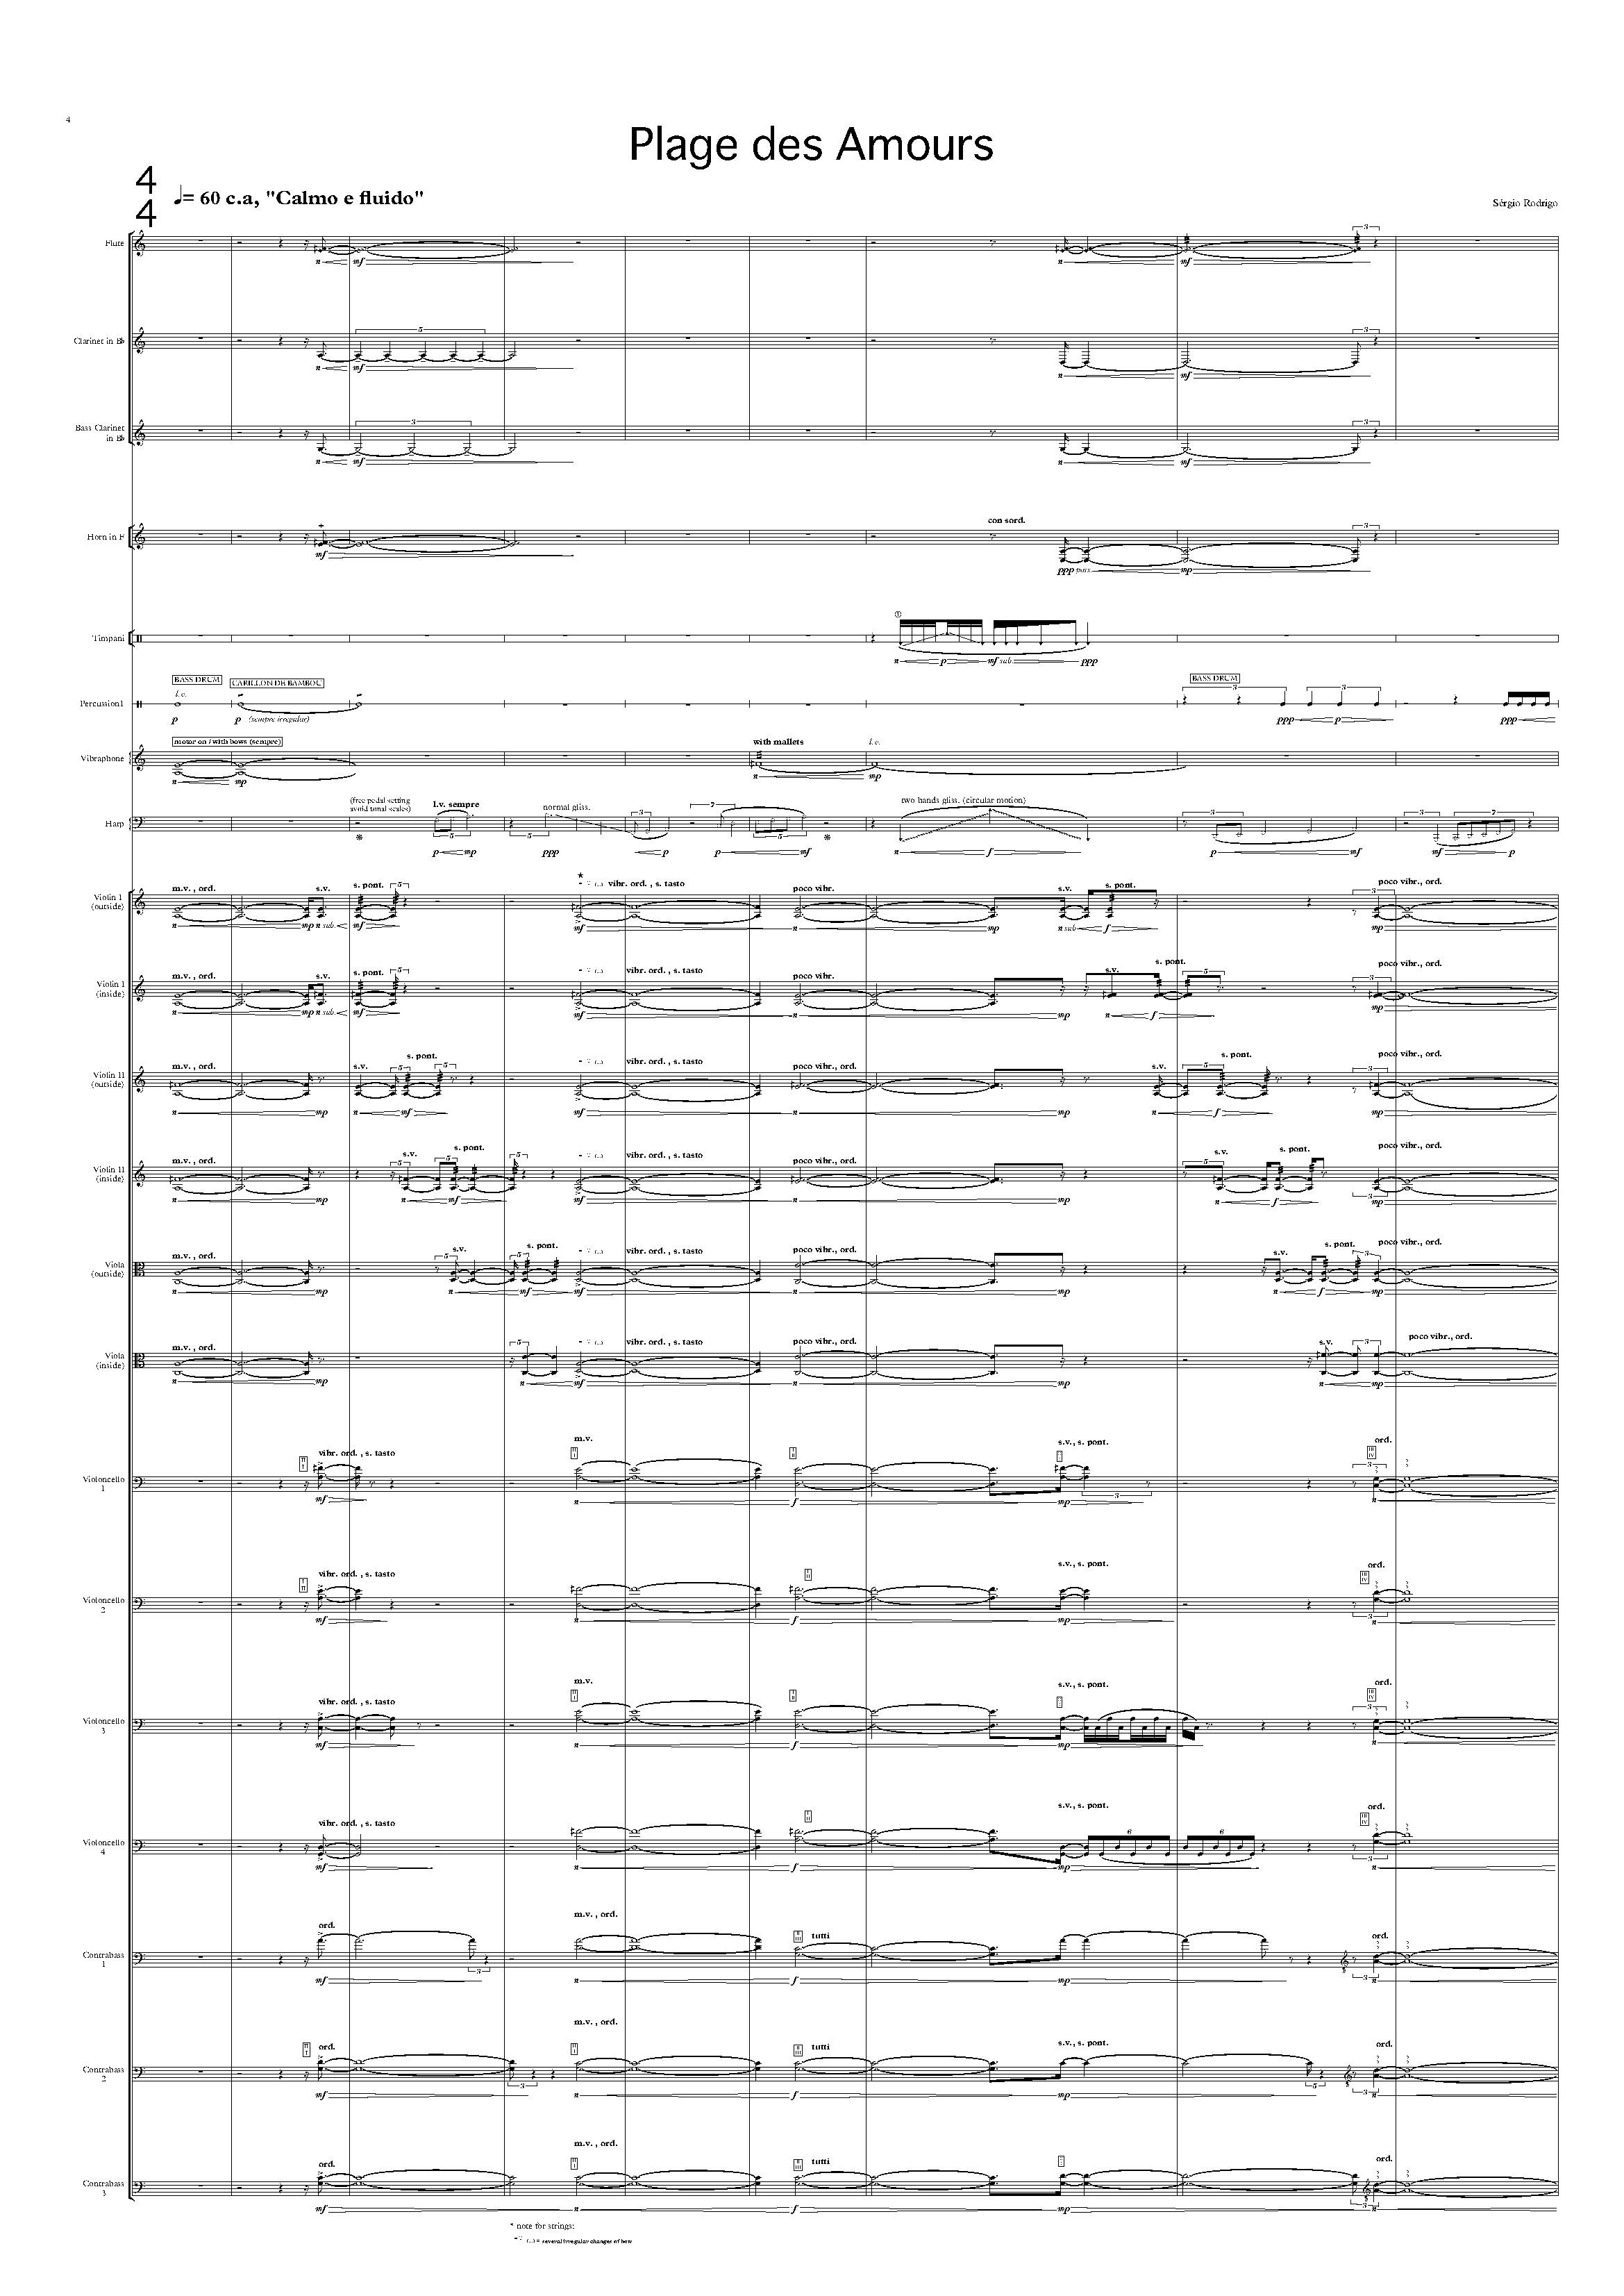 Plage des amours -Sérgio Rodrigo - Full Score_Seite_04.jpg